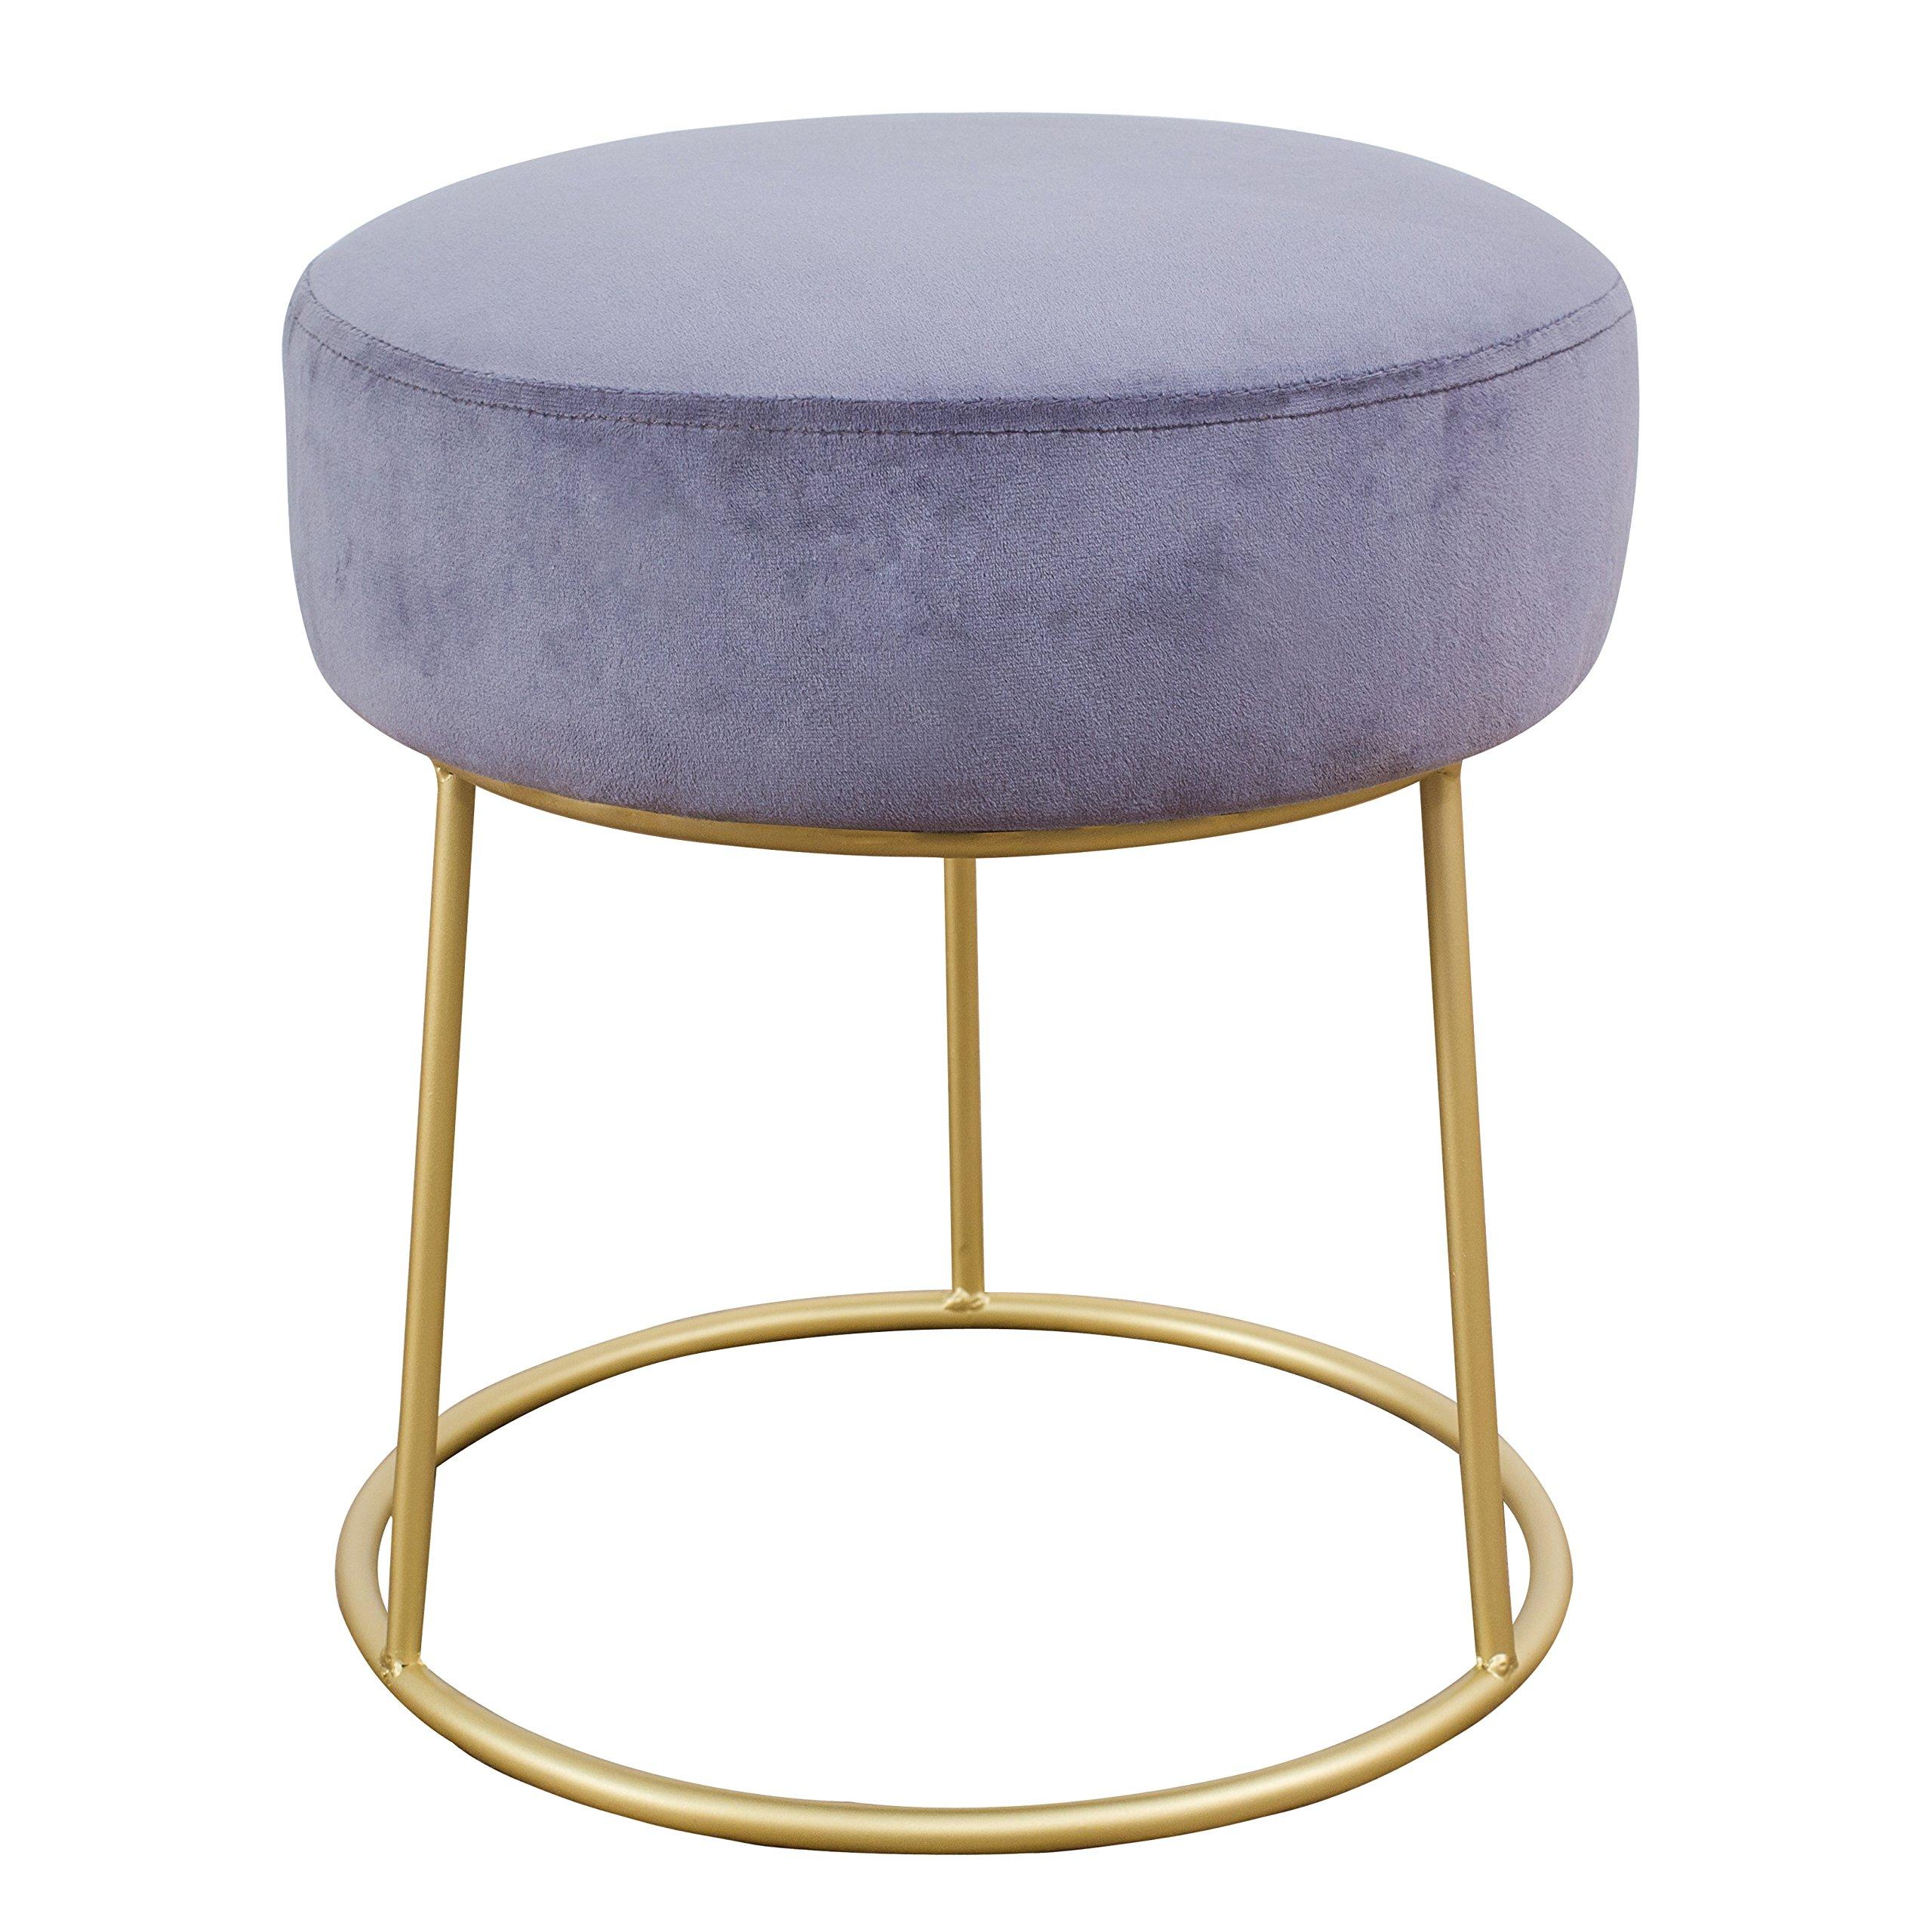 Tov Furniture TOV-OC3804 The Nina Collection Modern Velvet Upholstered Round Backless Short Stool with Gold Base Grey